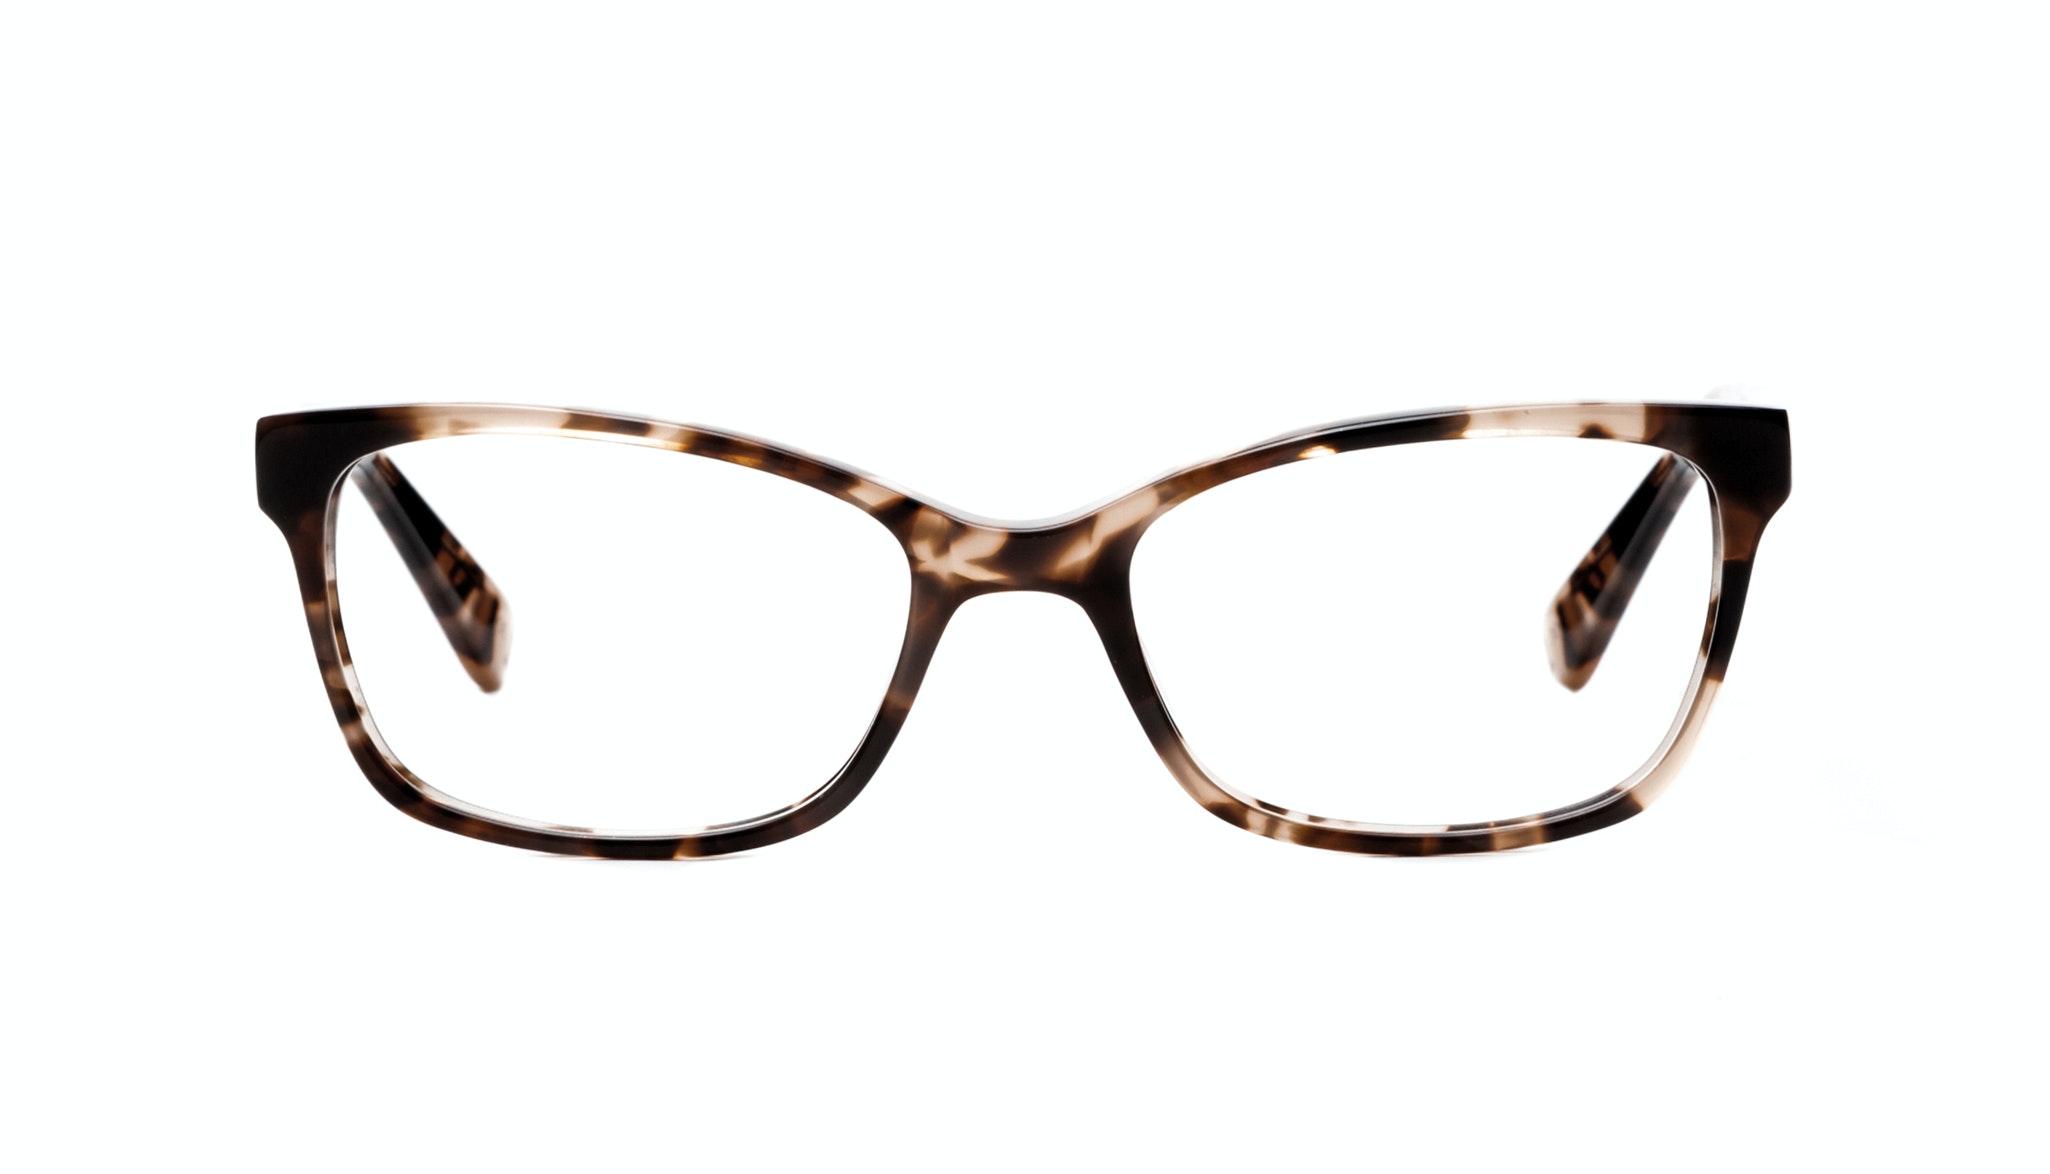 Affordable Fashion Glasses Cat Eye Rectangle Square Eyeglasses Women Comet Pink Tortoise Front